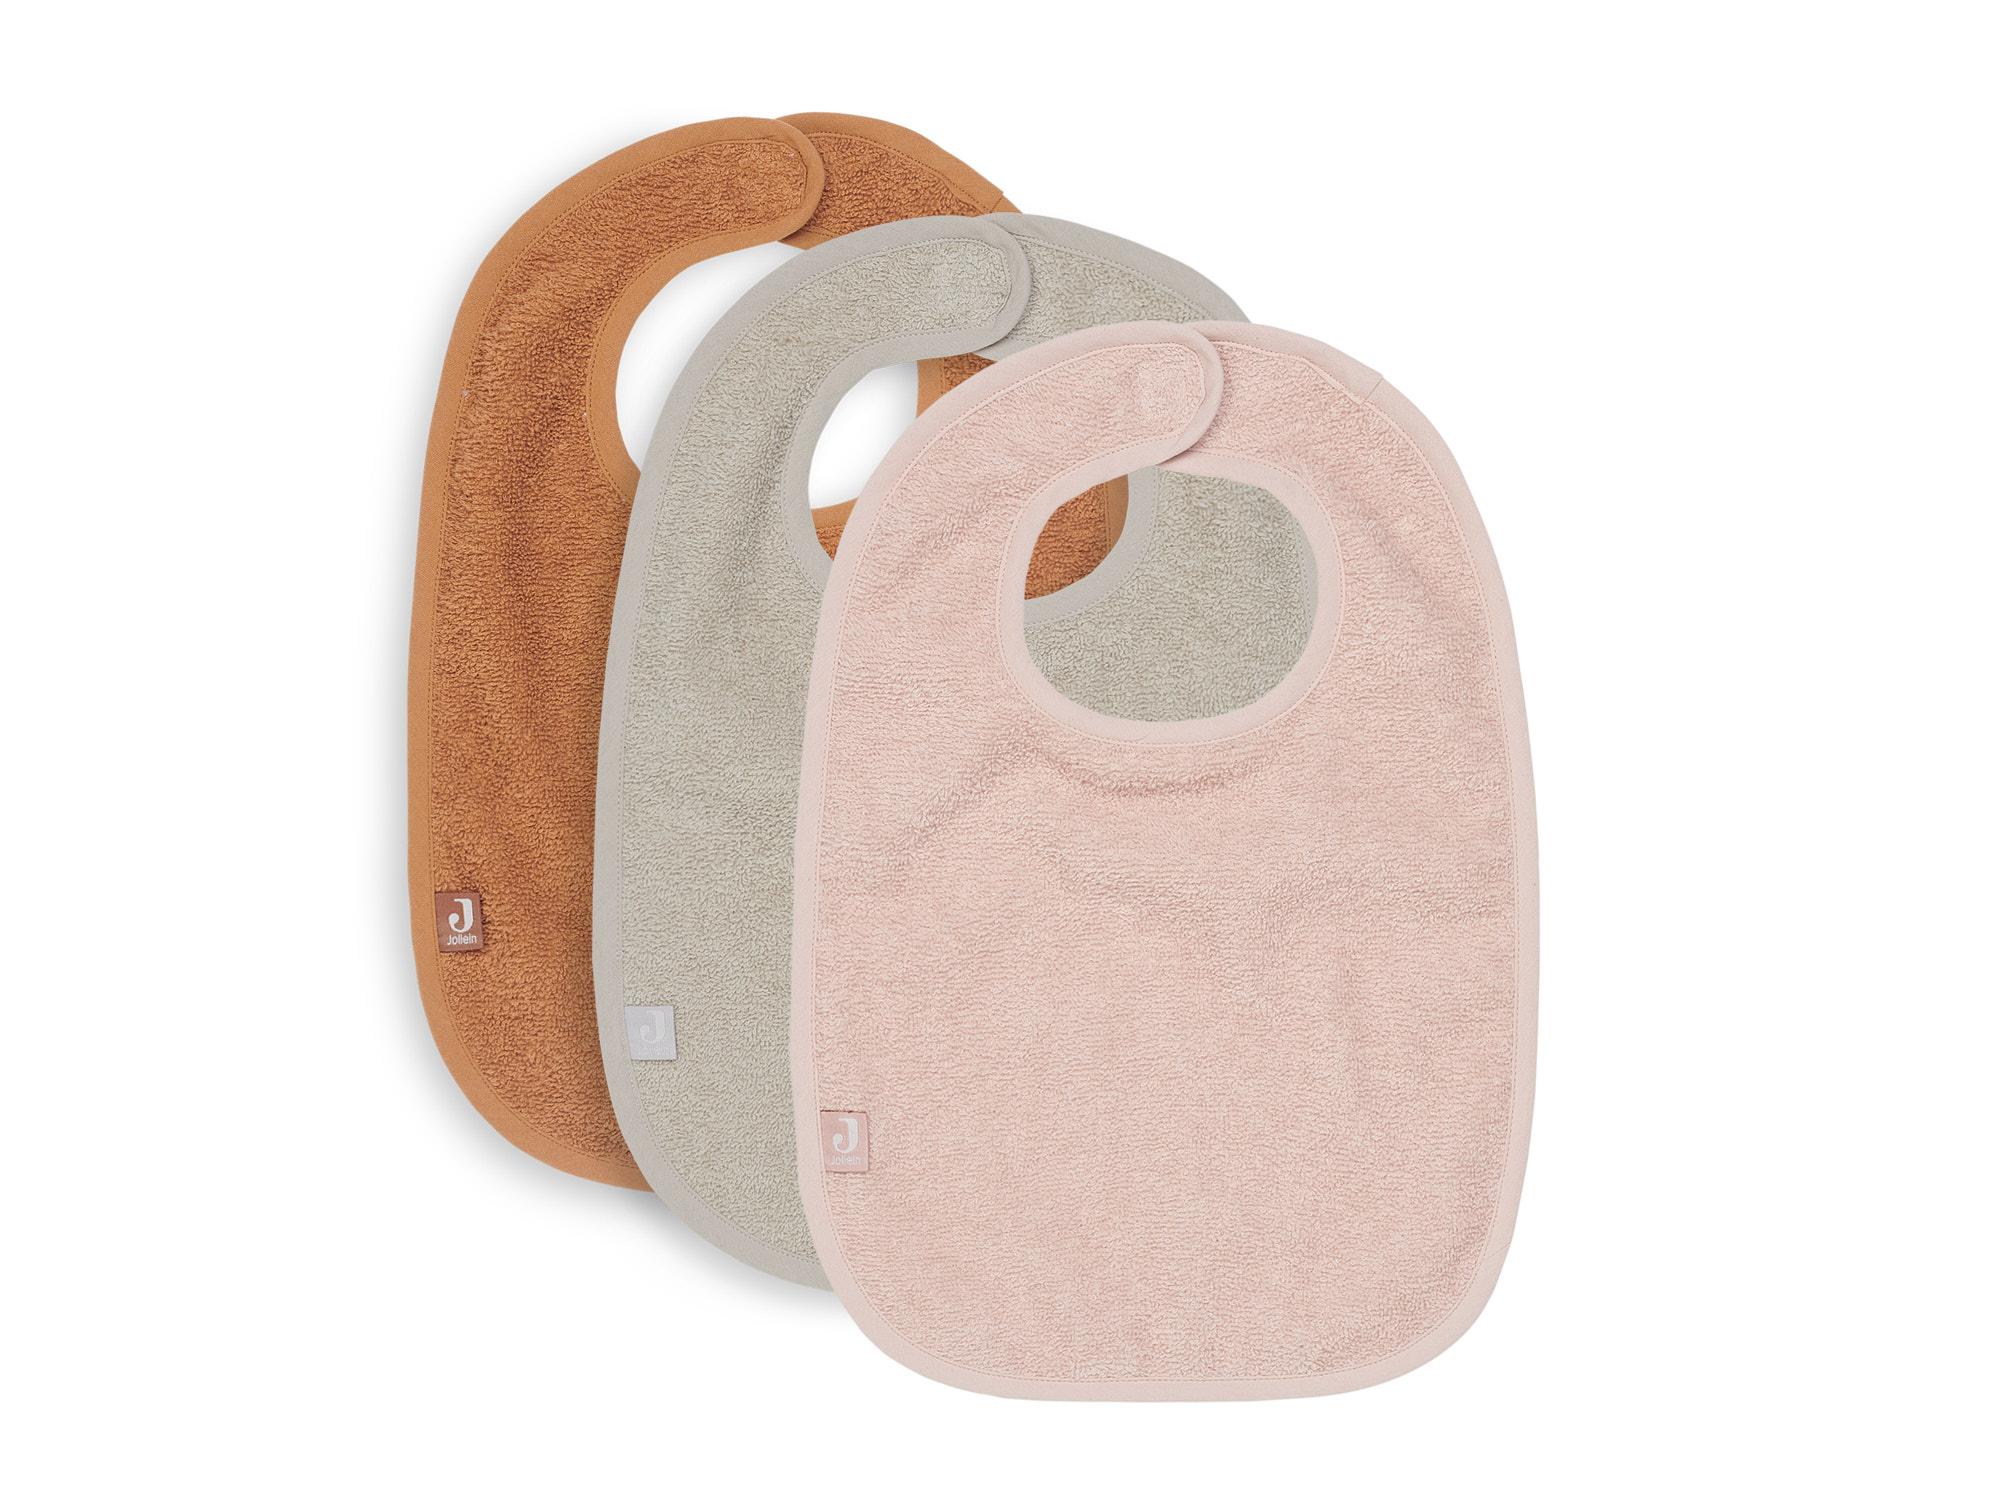 Afbeelding Jollein Set van 3 slabbetjes badstof I Pale pink/nougat/caramel